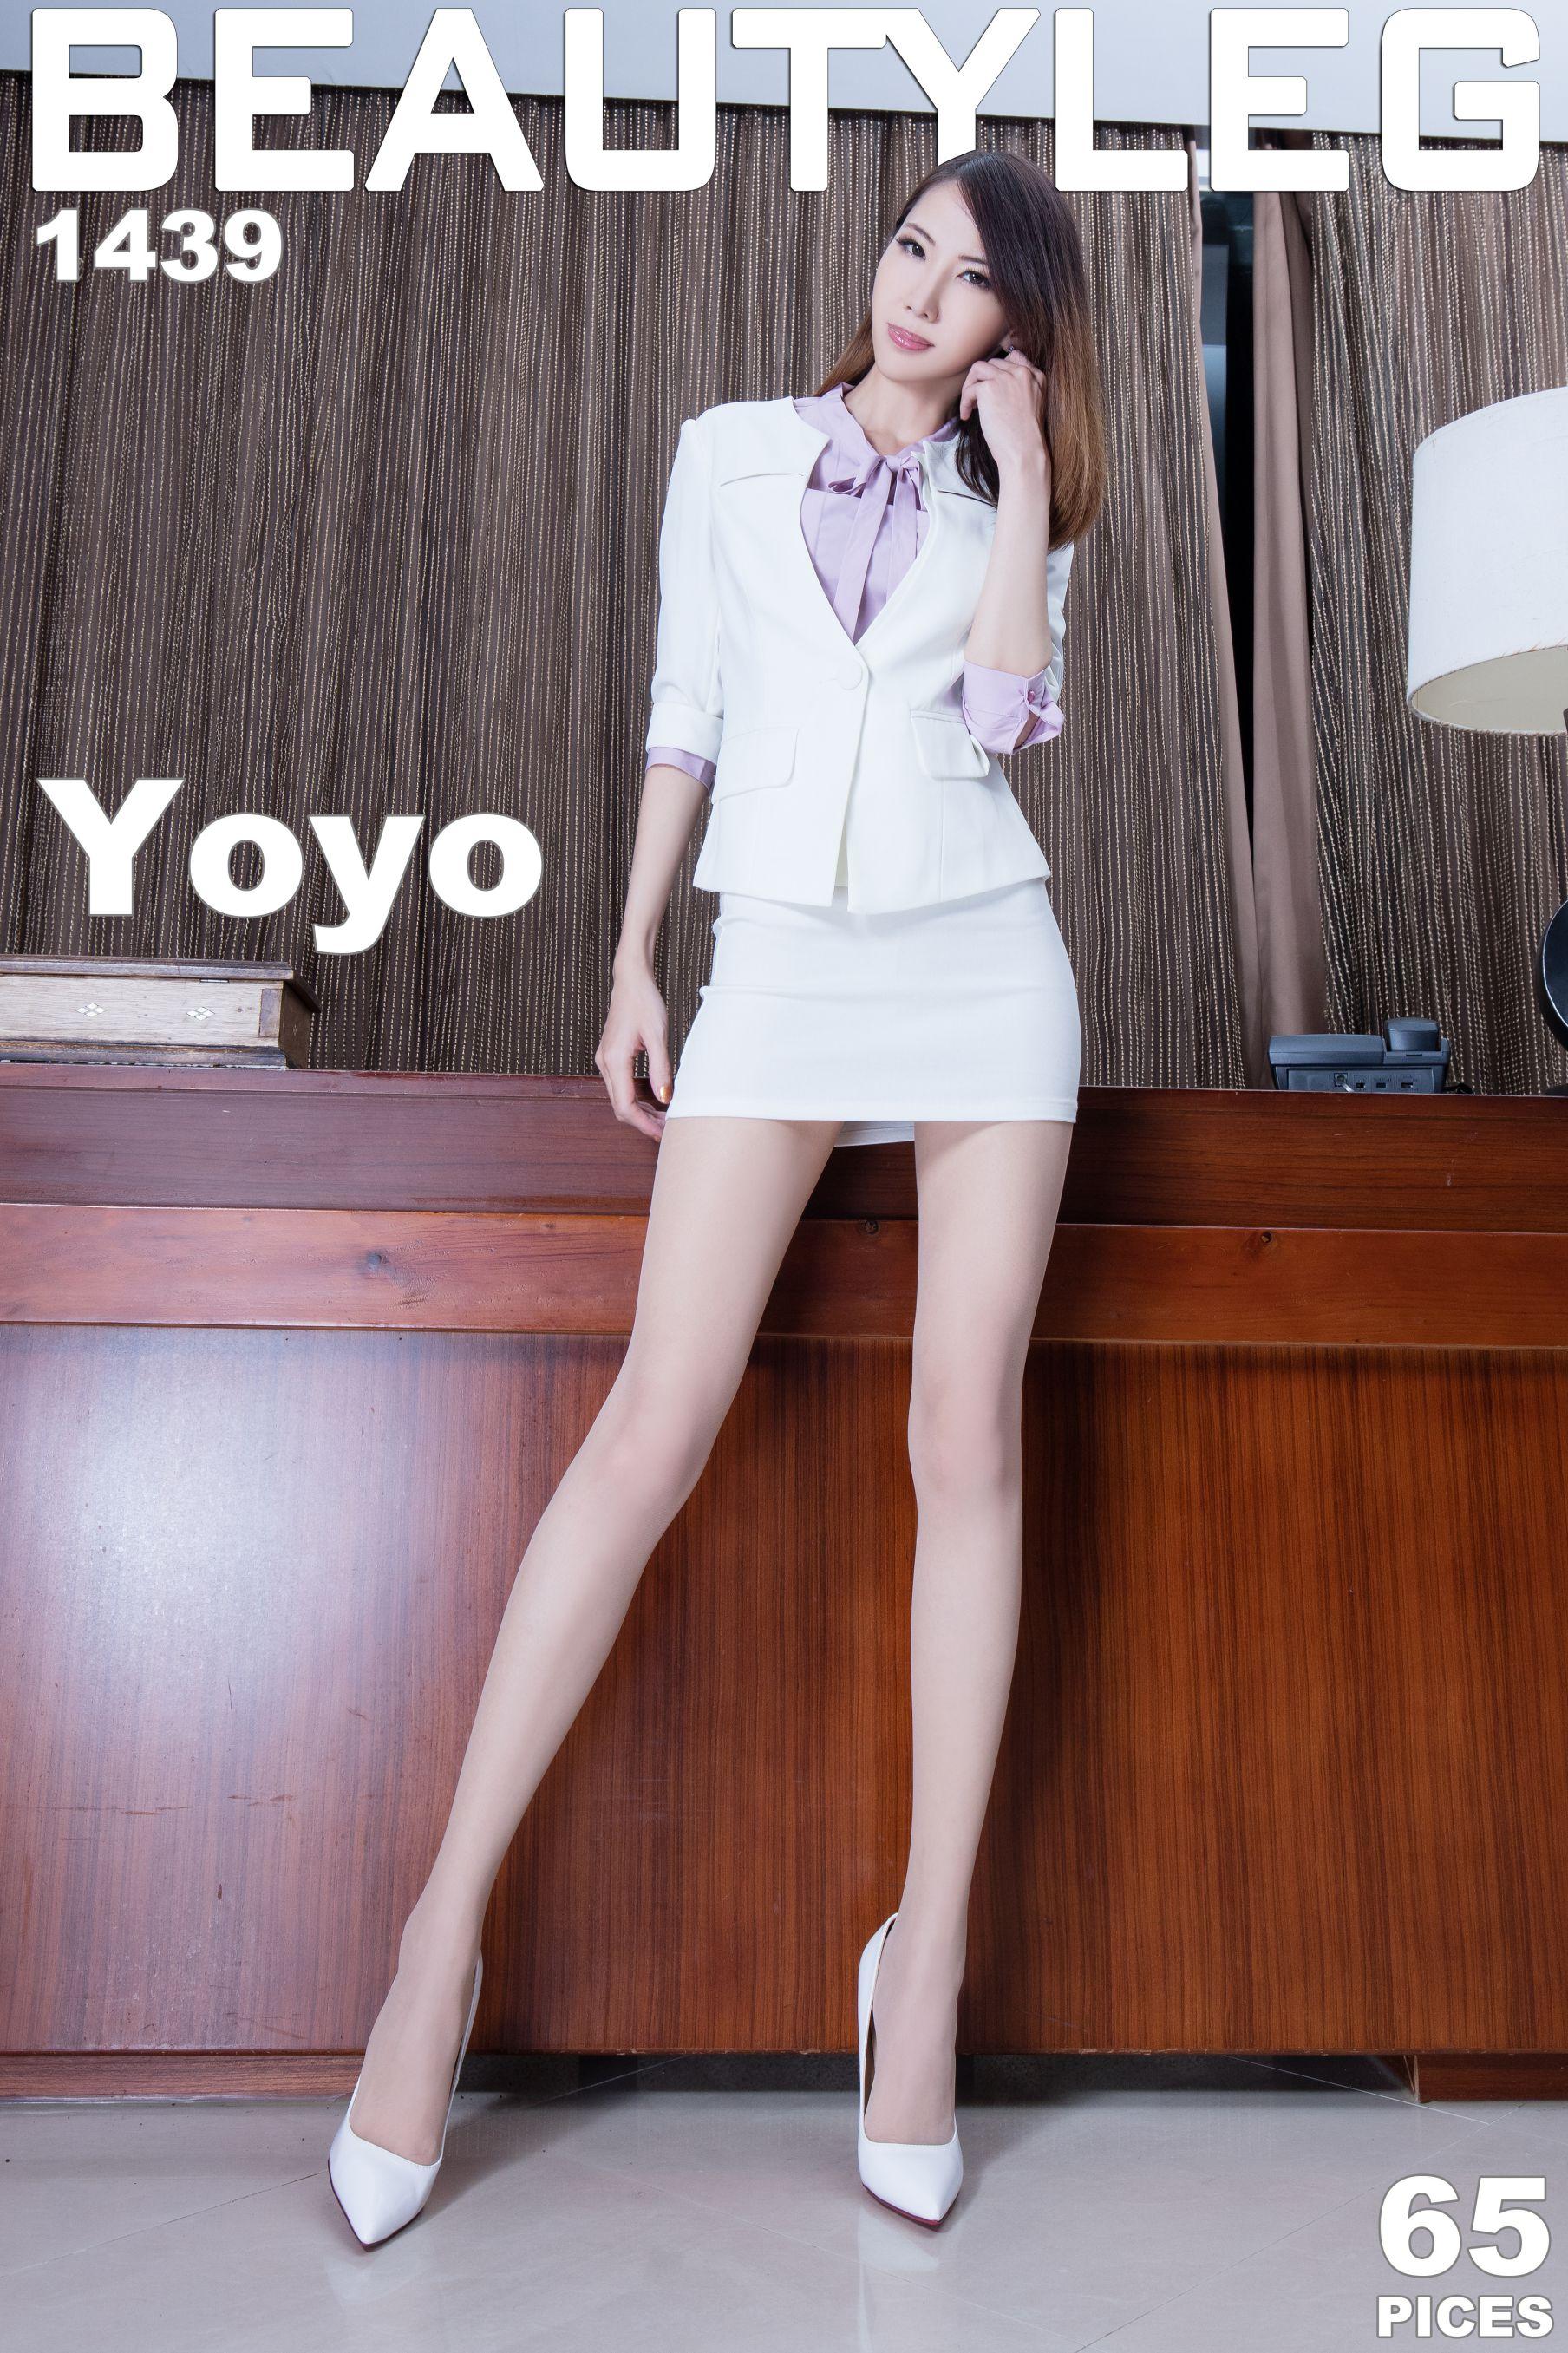 VOL.1465 [Beautyleg]OL美女西装美女长腿美女:童采萱(Beautyleg Yoyo,腿模Yoyo)高品质写真套图(51P)